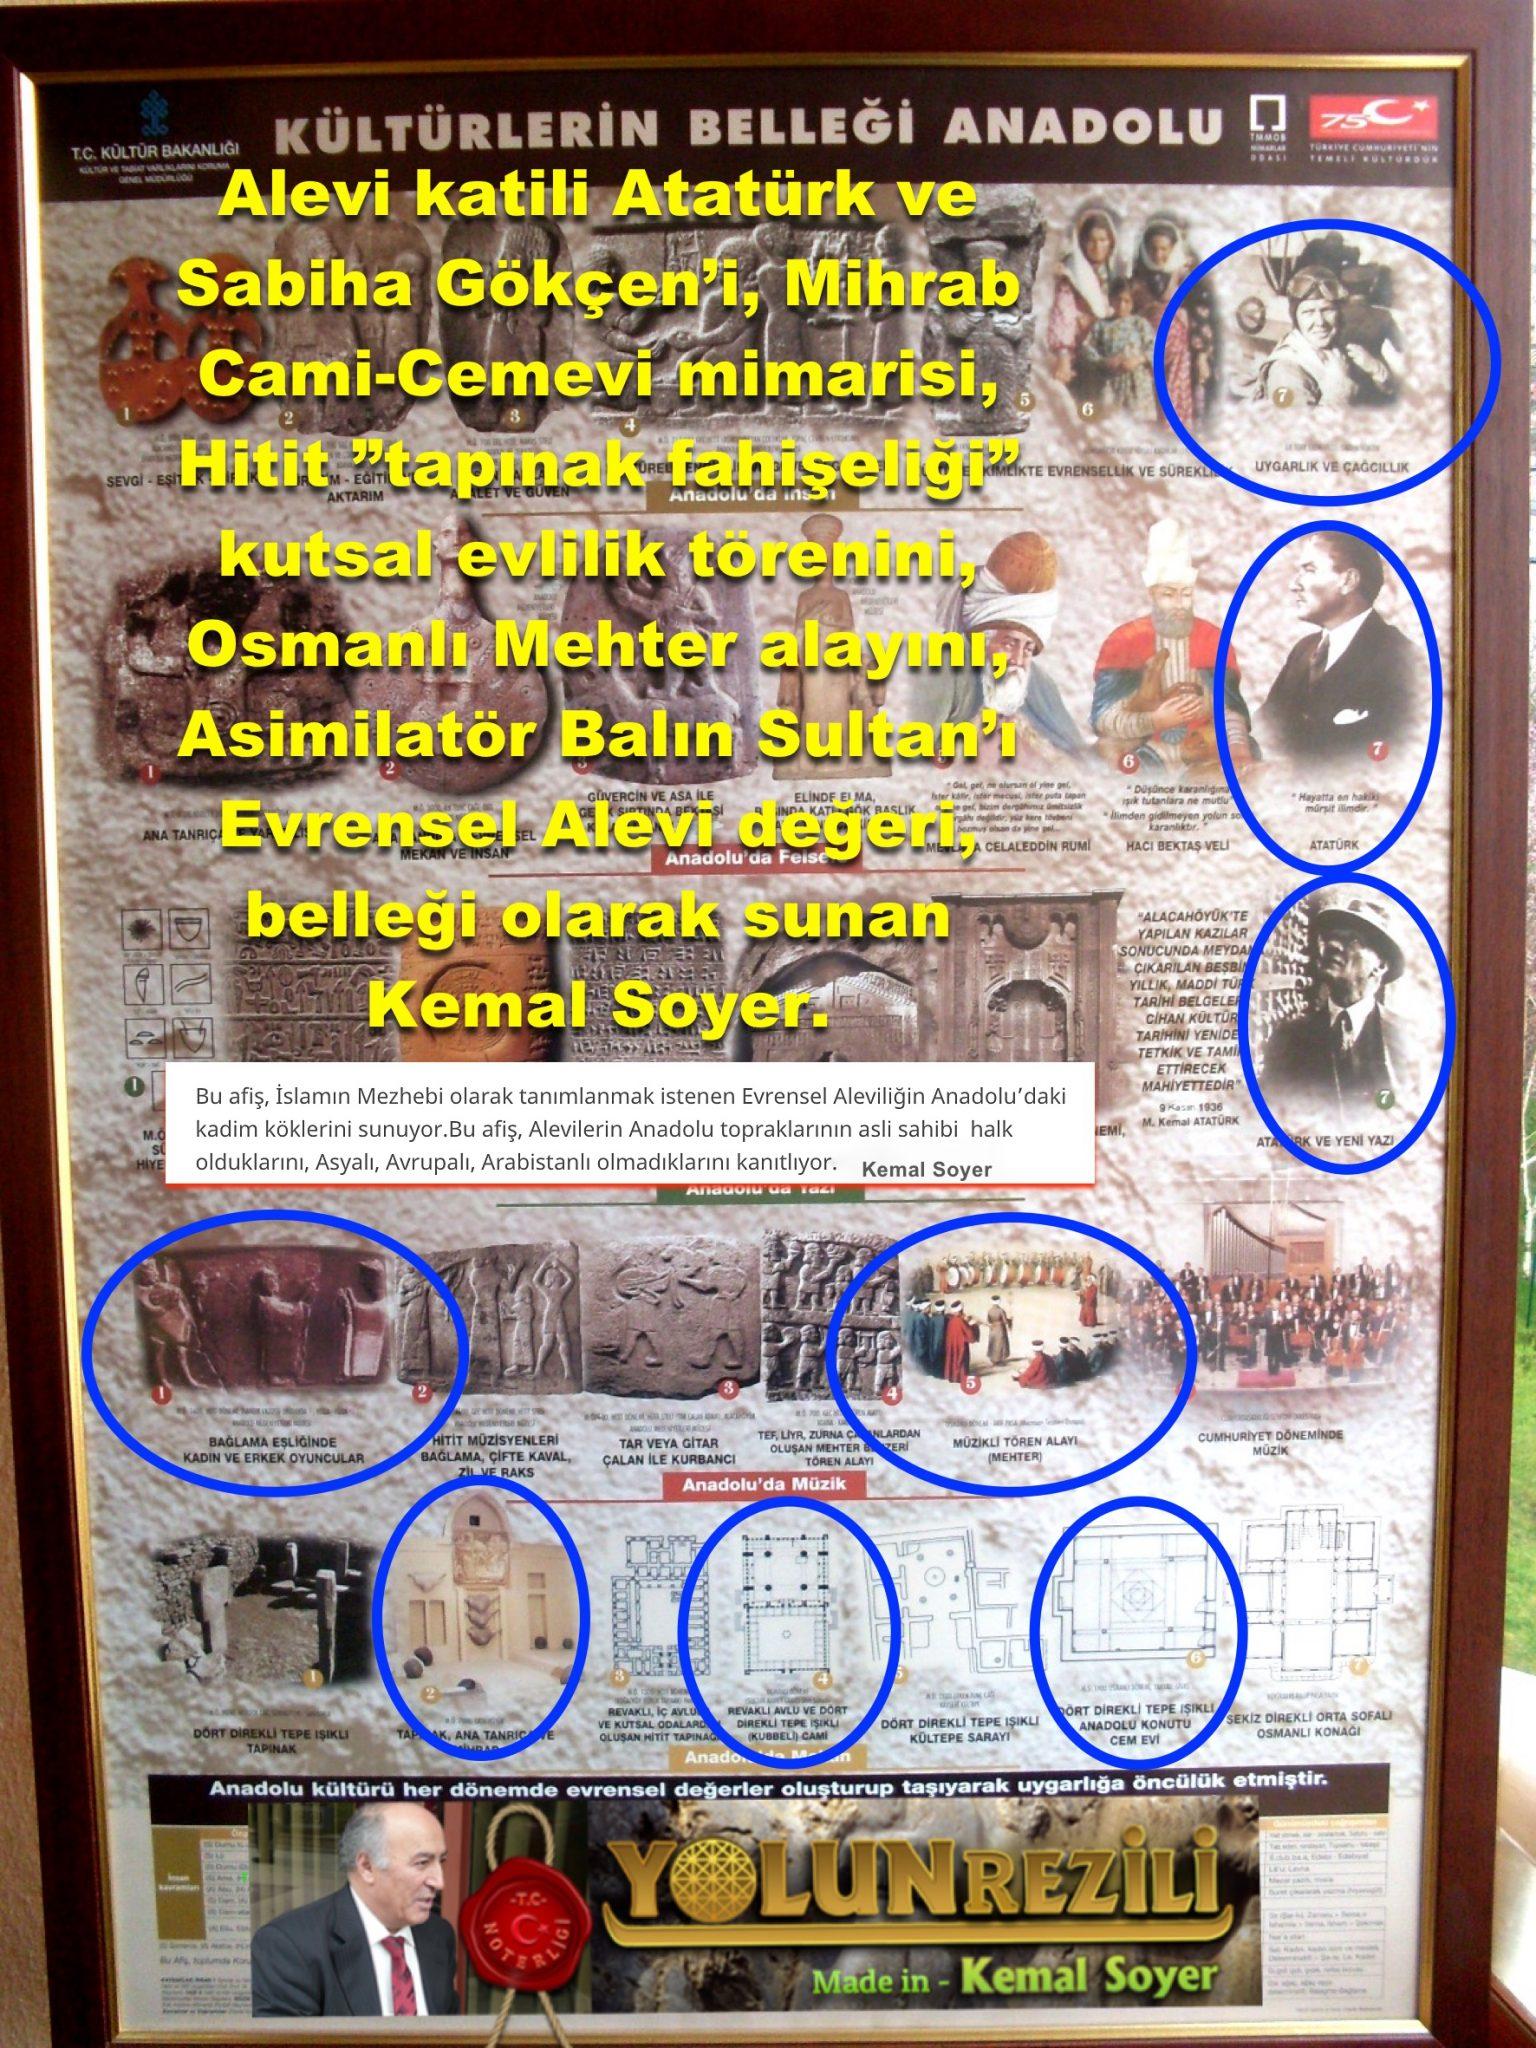 hitit ataturk kemal soyer AFİS Yolun ezeli Alevi cem semah Bektaşi kızılbaş pir sultan devrimci Aleviler DAB Acar